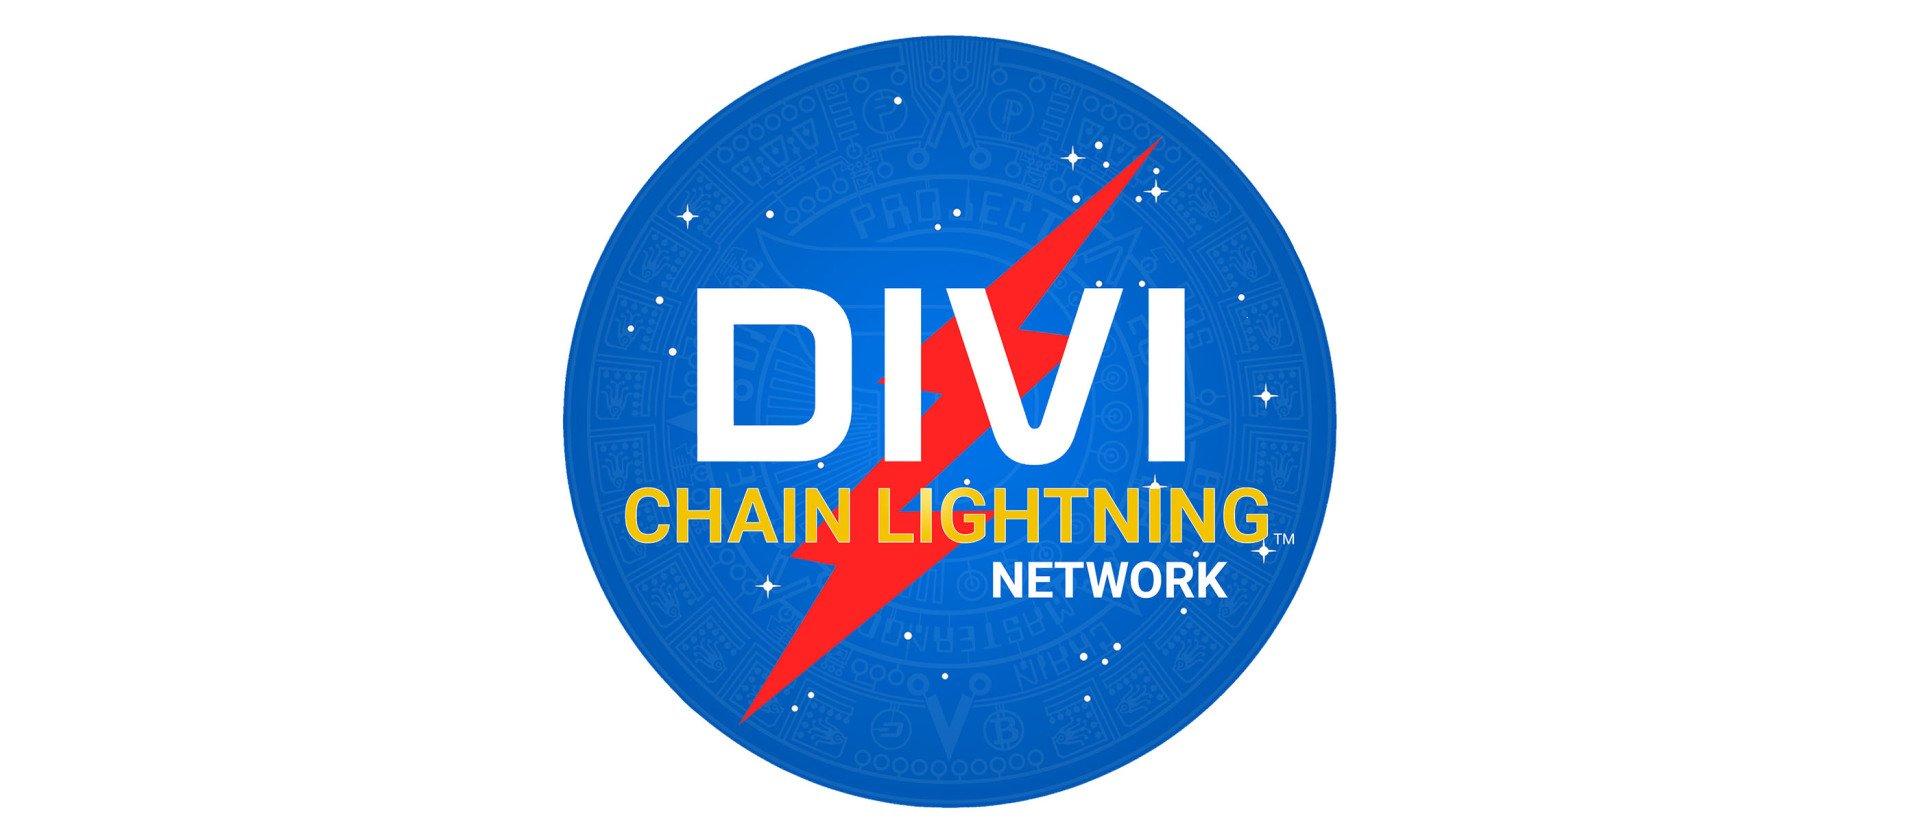 DIVI Coin Lightning Network Solution